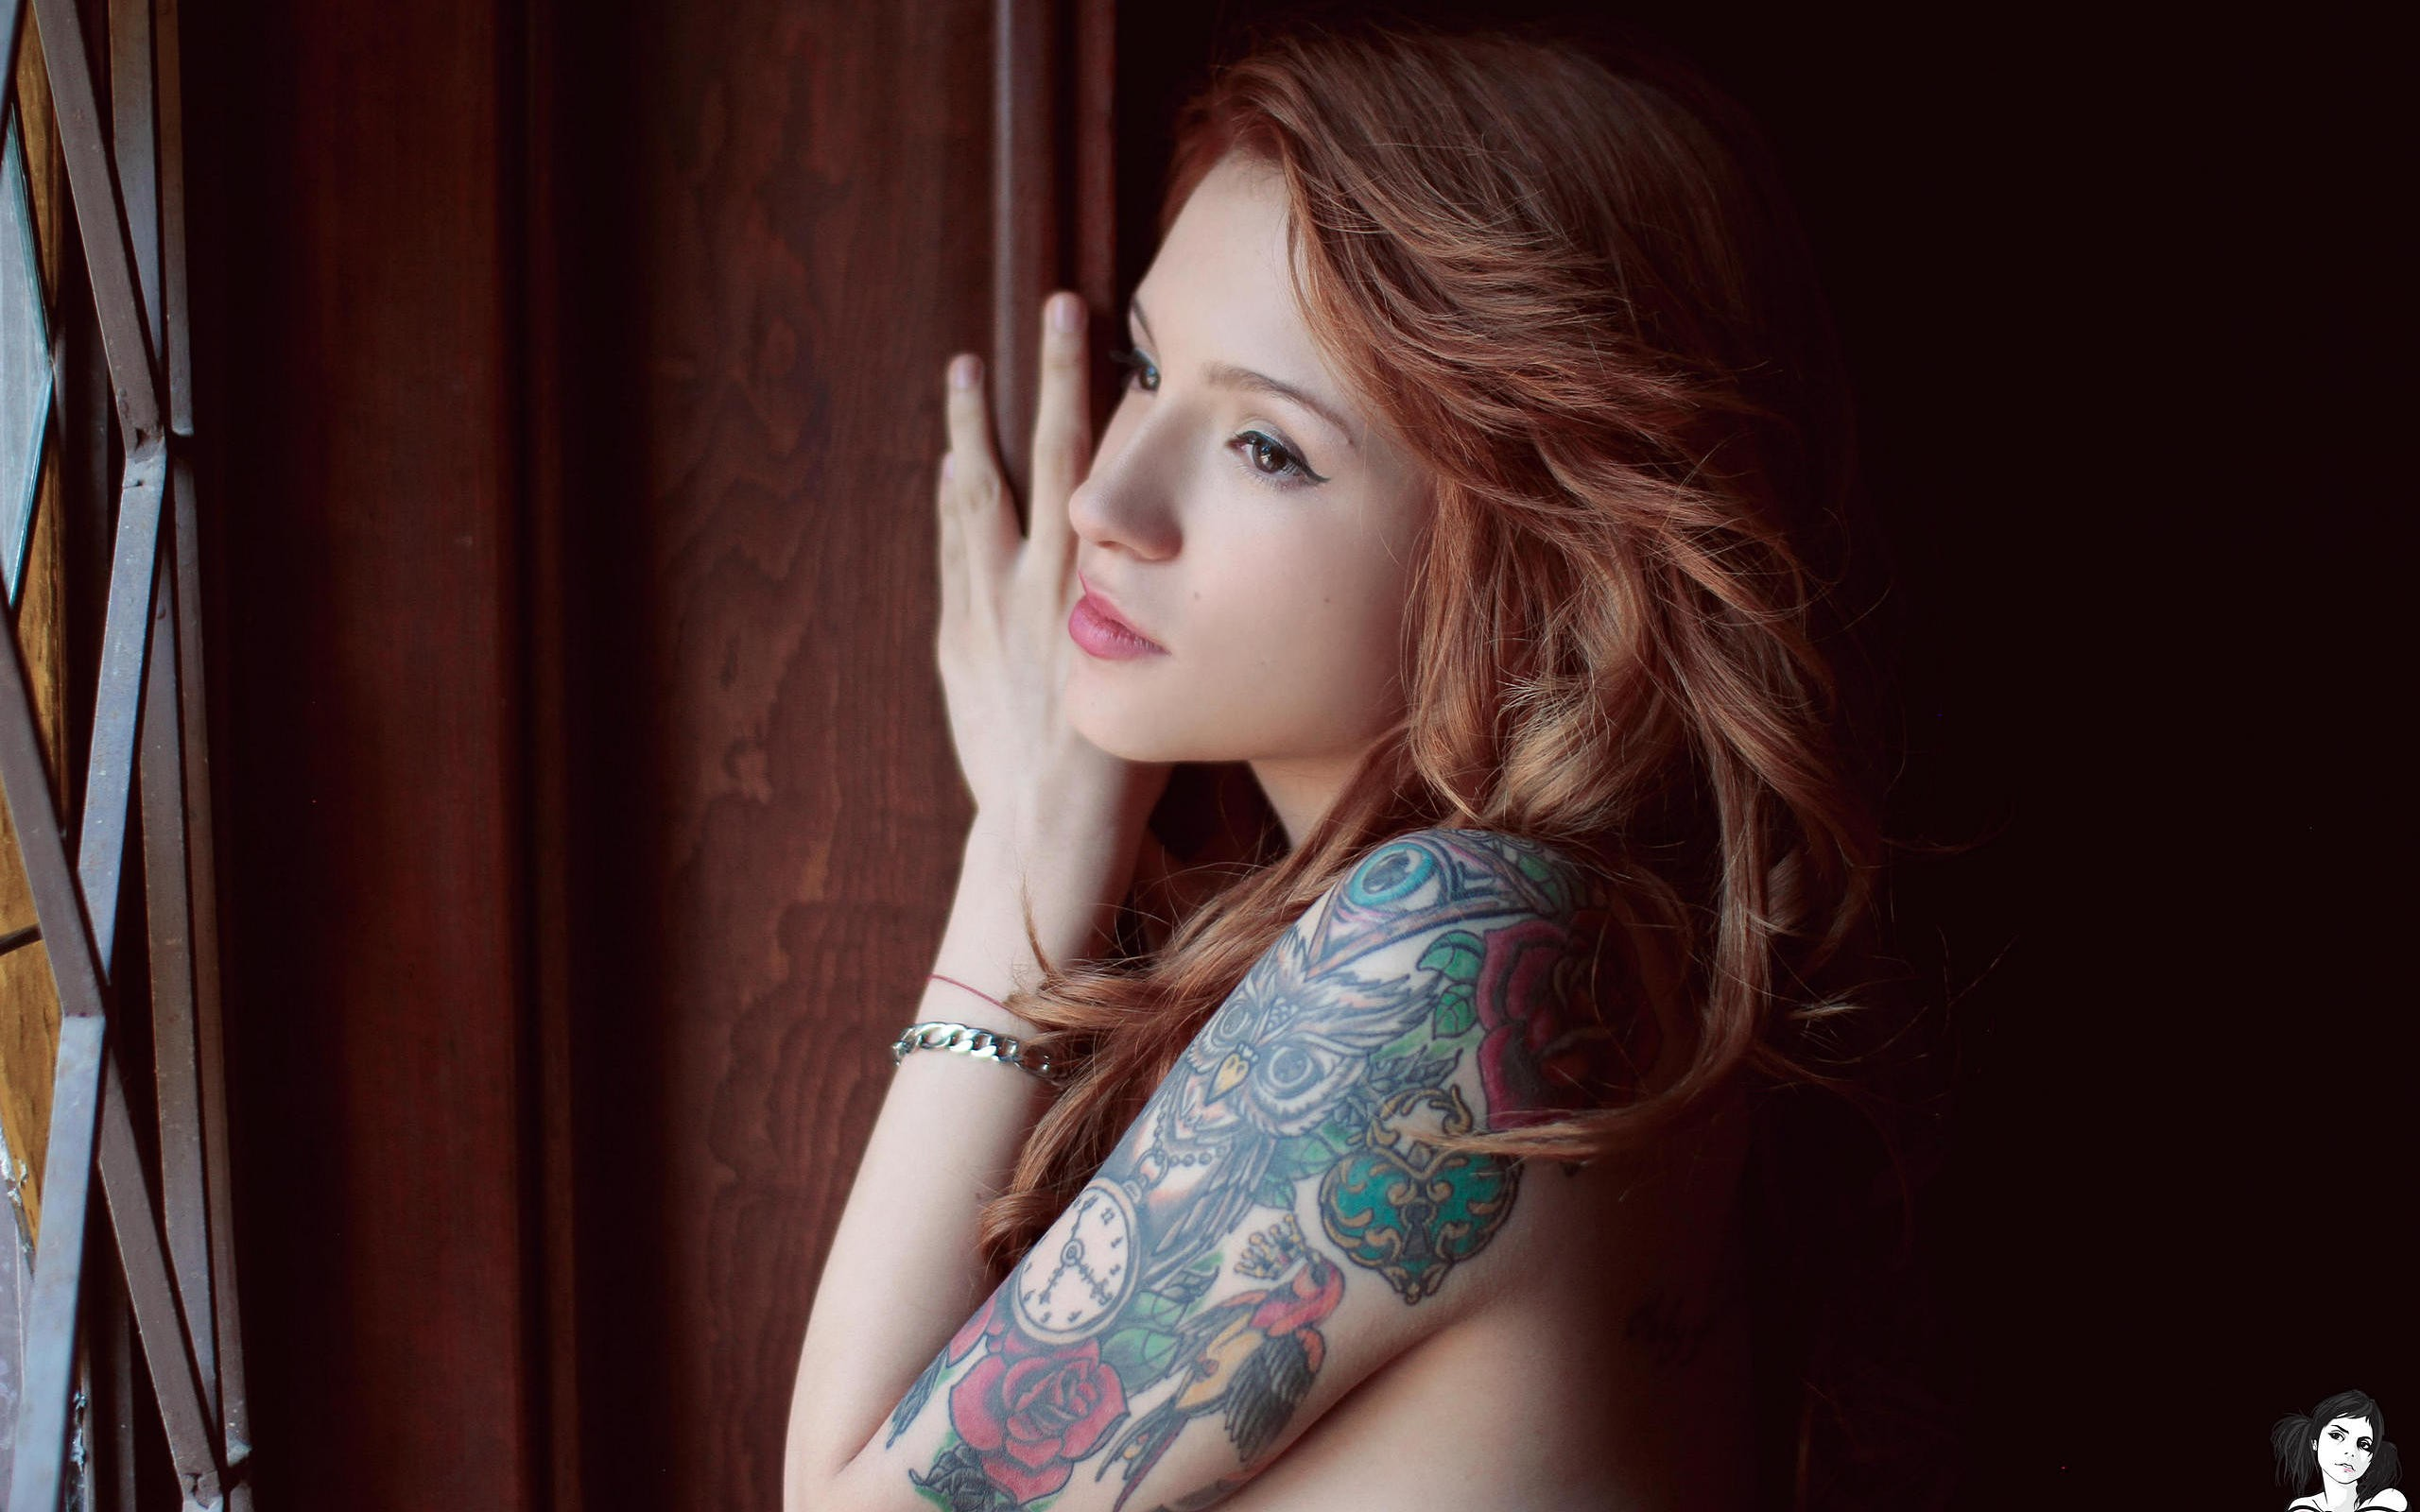 Skynbird suicide nude, freaks homemade porn pictures